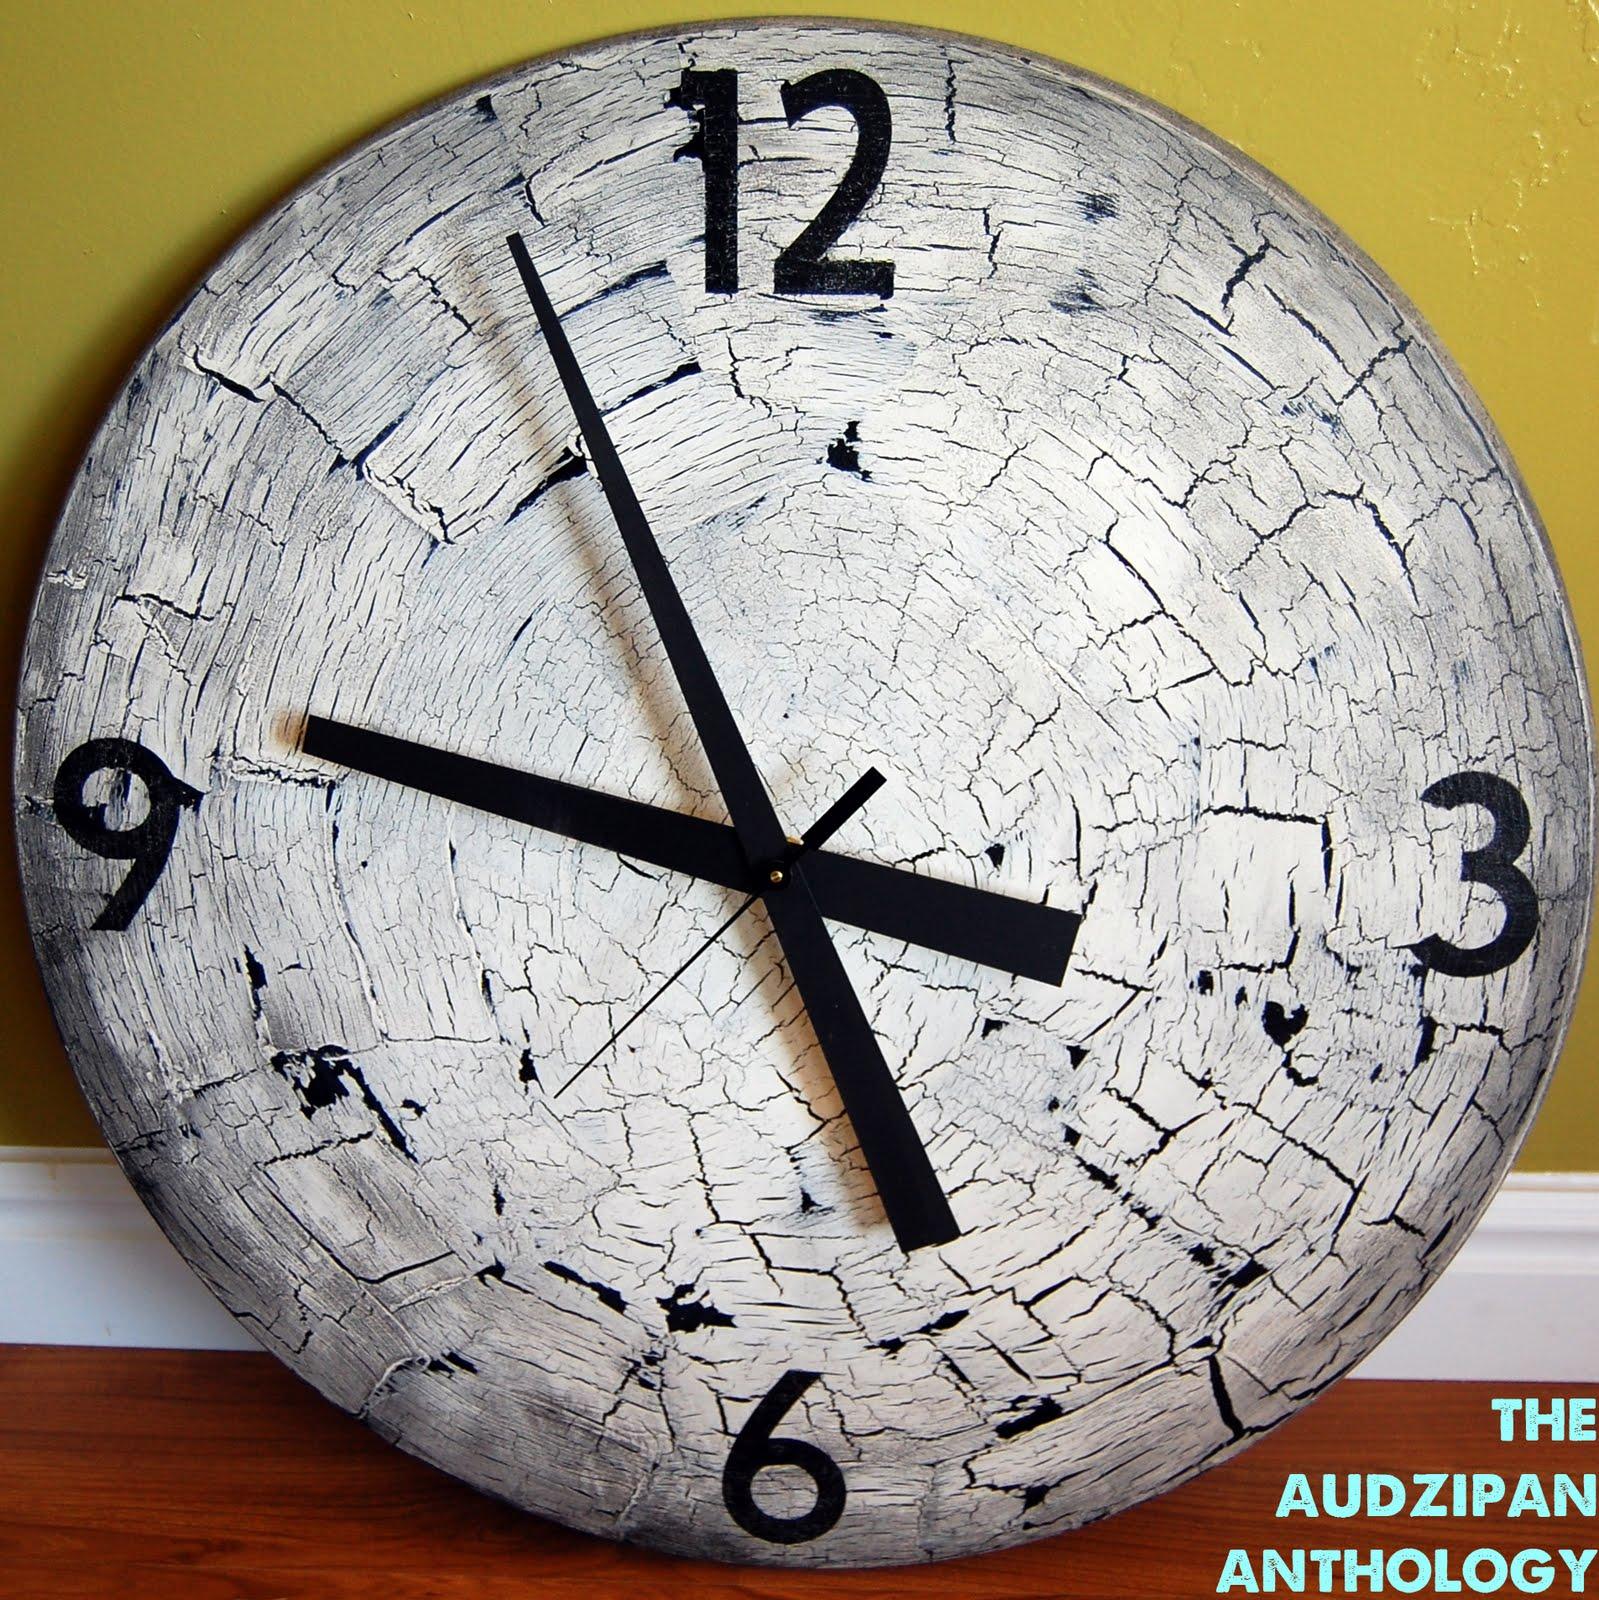 the audzipan anthology: DIY Big Wall Clock